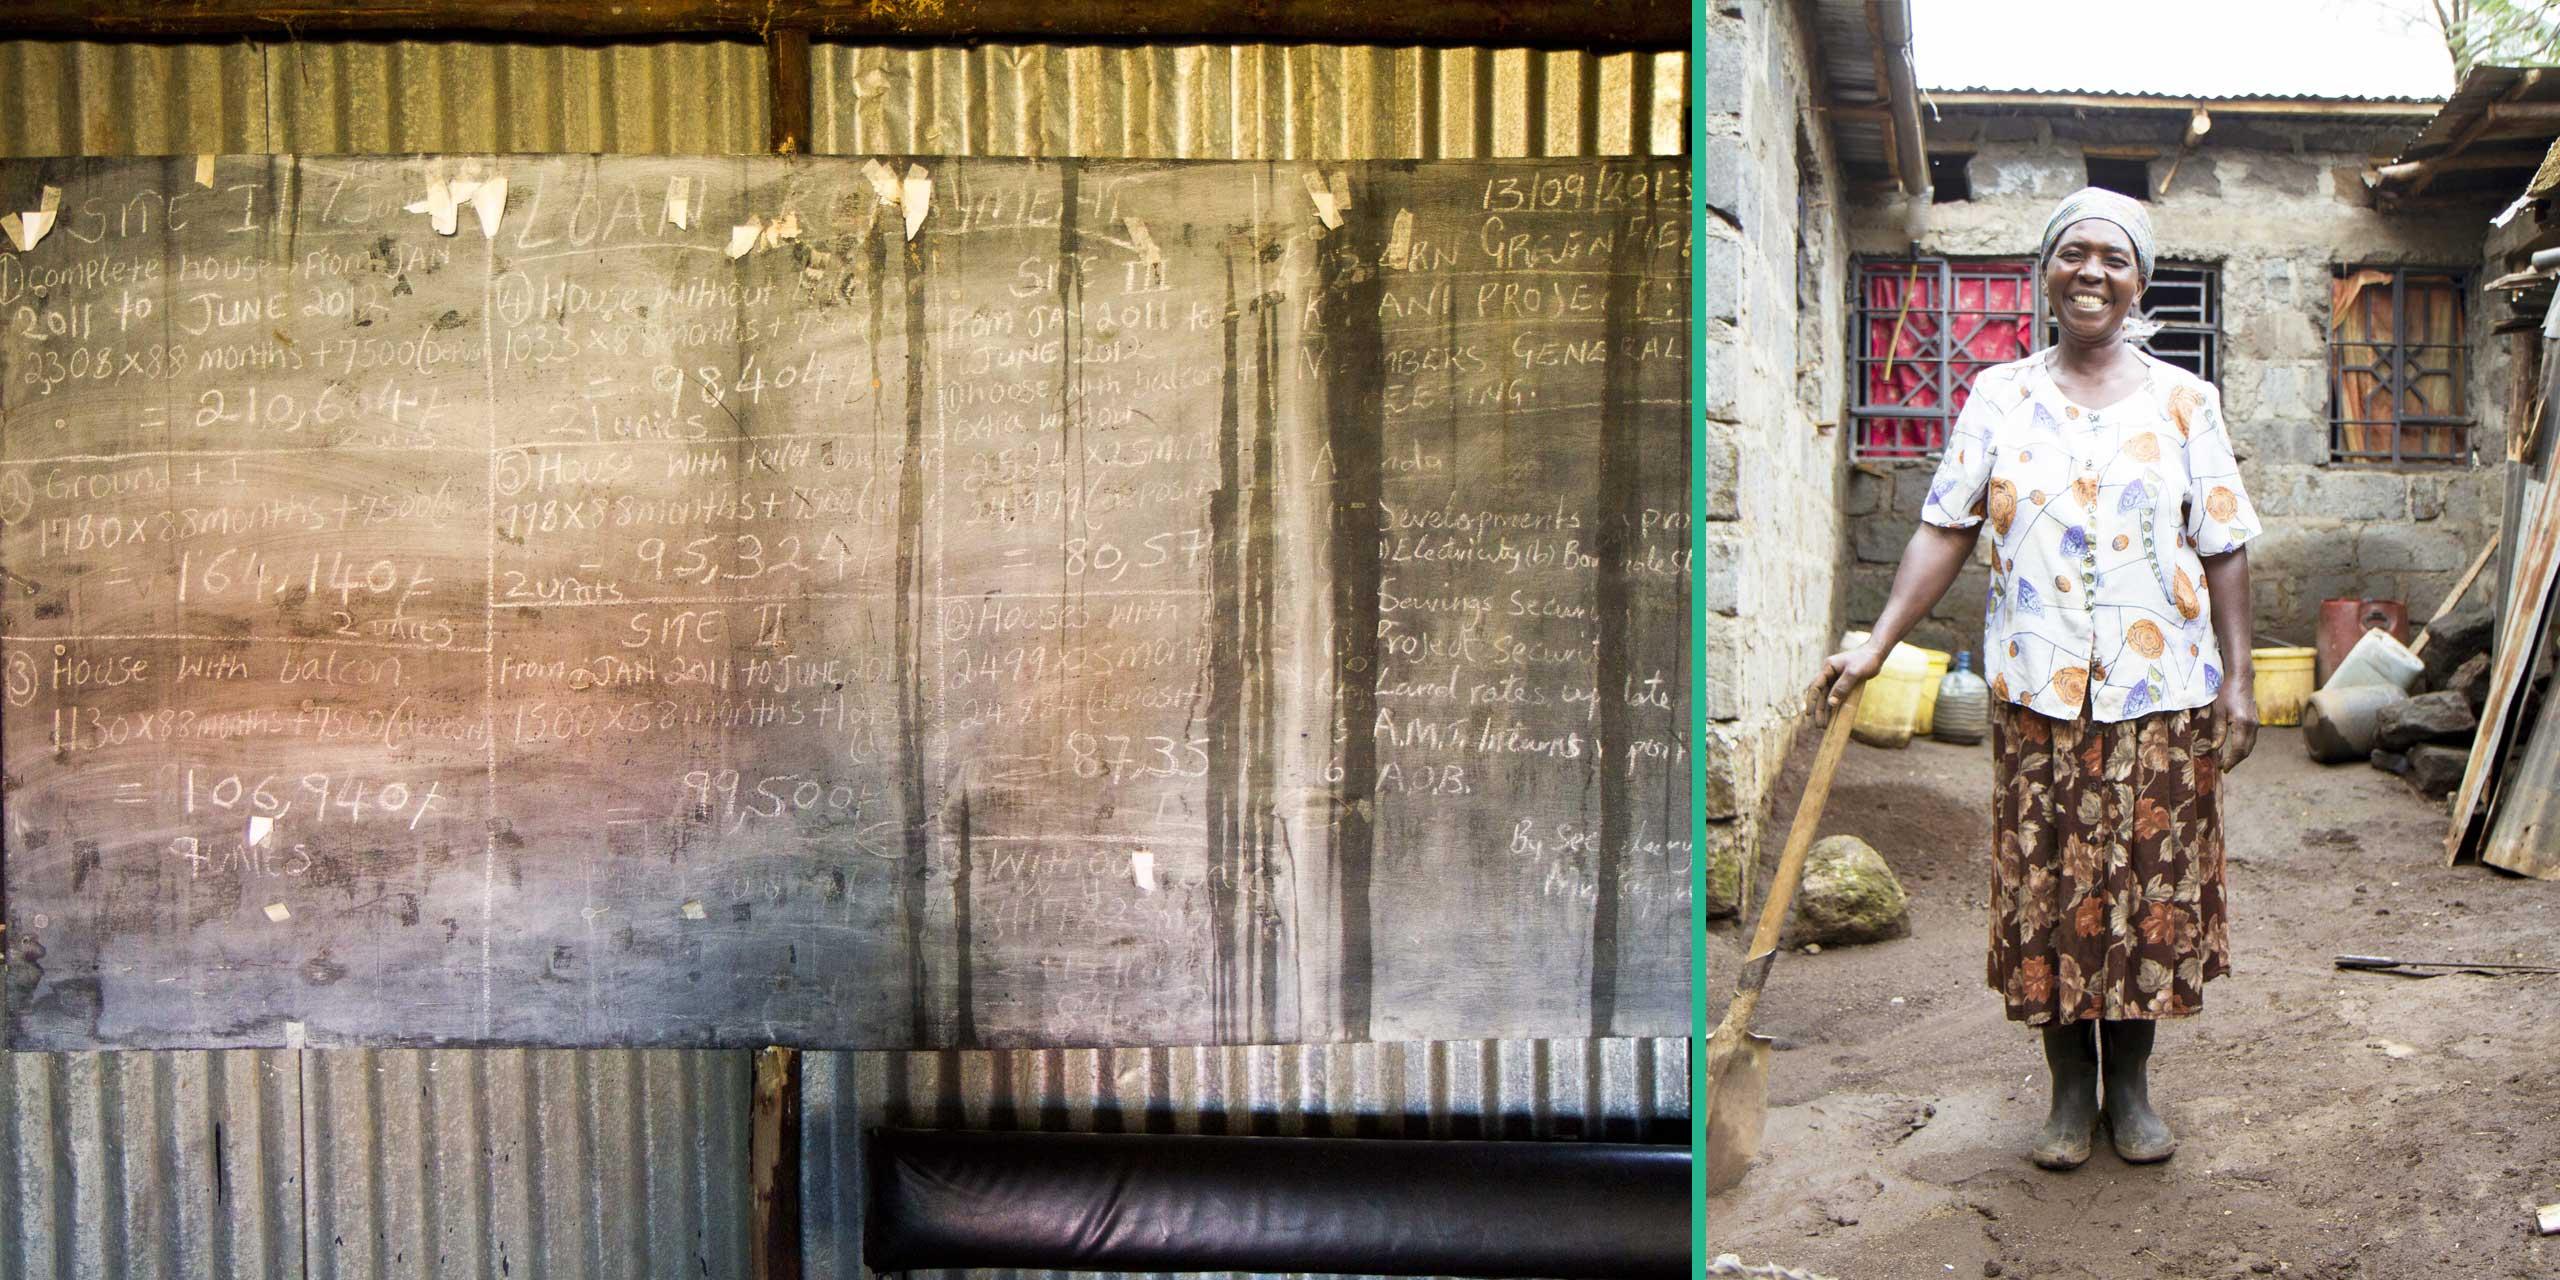 https://s12982.pcdn.co/wp-content/uploads/2015/01/slum-dwellers-international-sl2.jpg